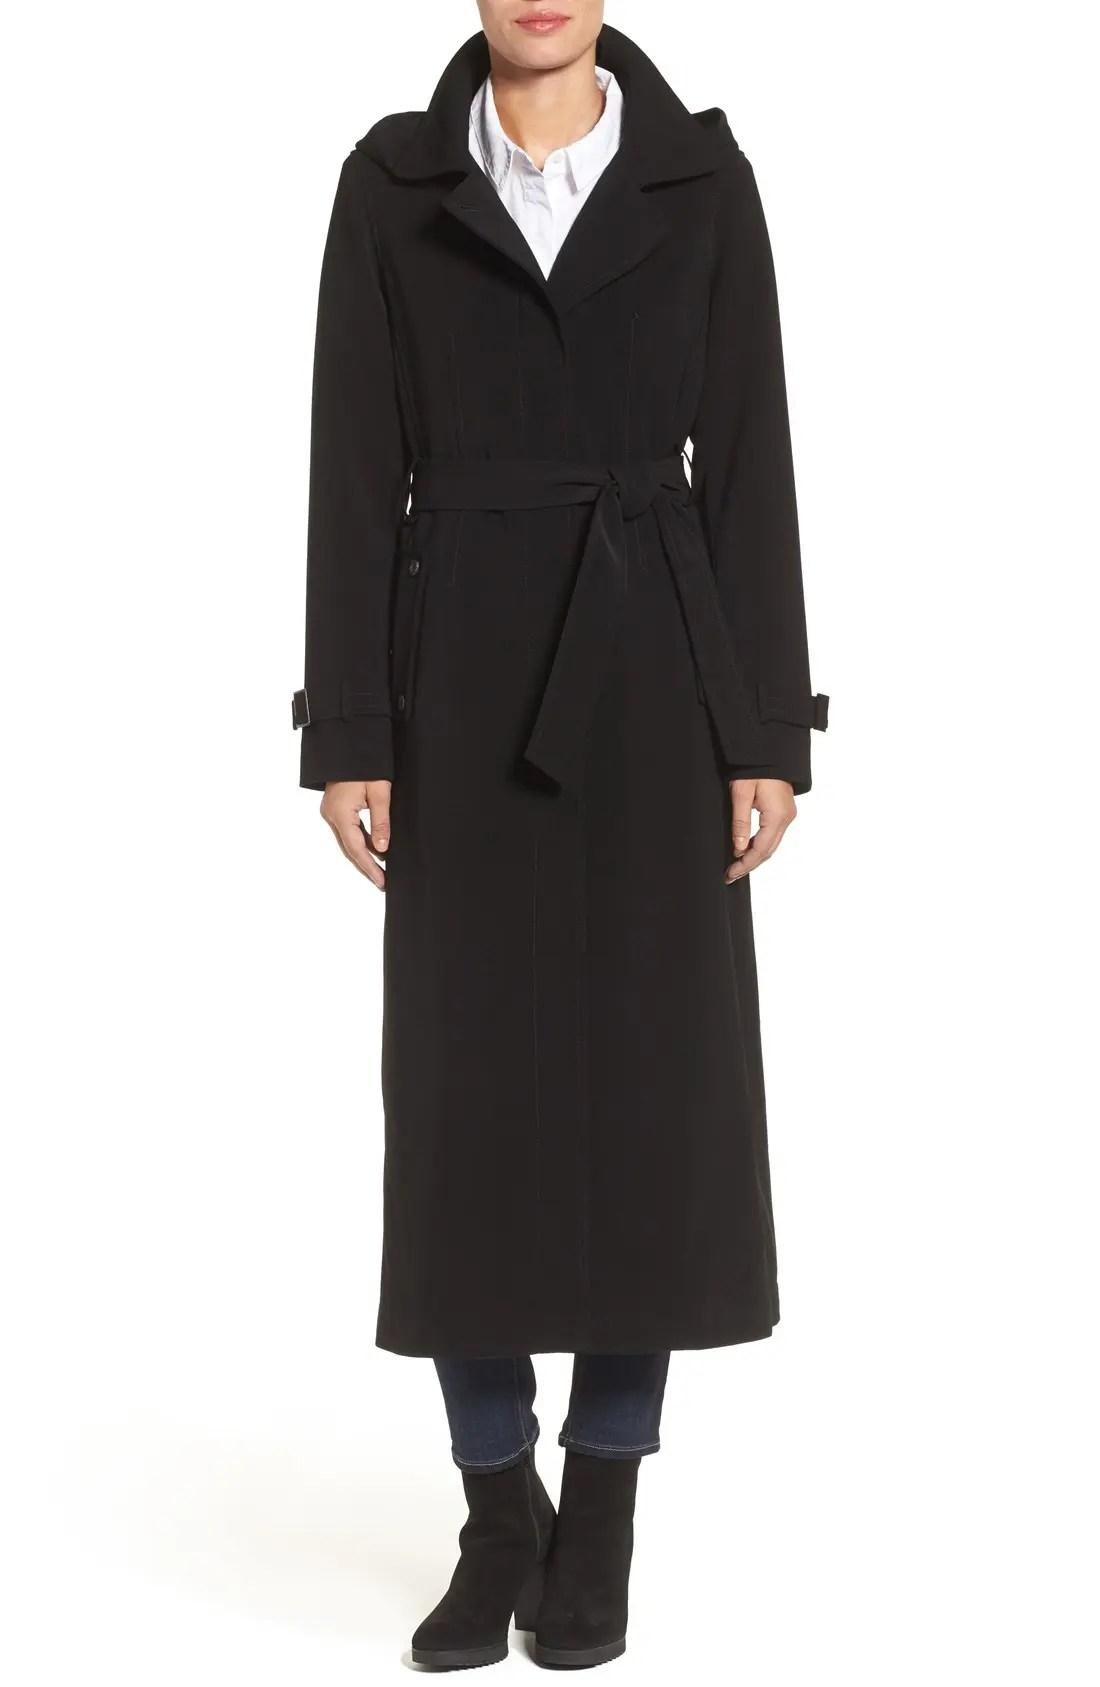 Full Length Hooded Nepage Raincoat $239.9